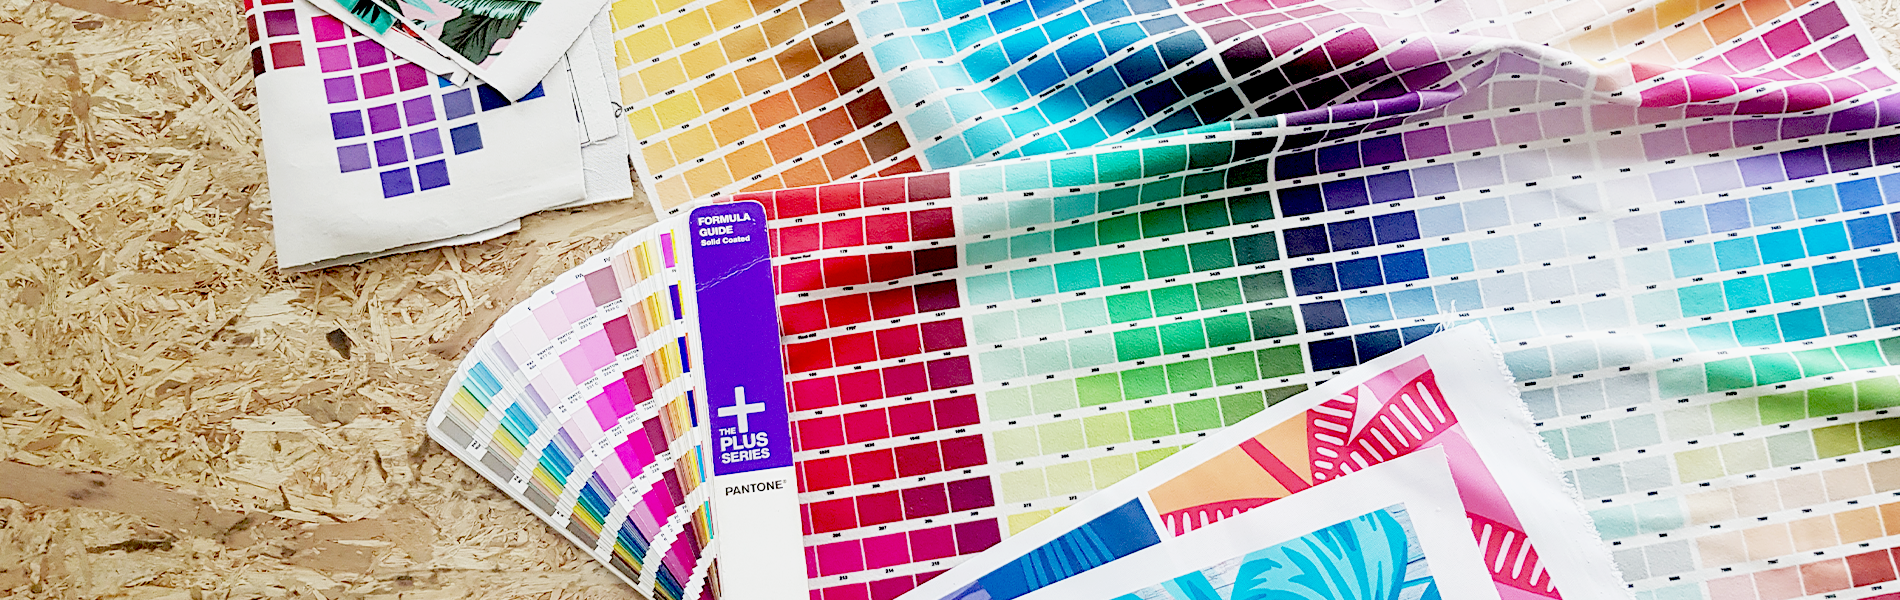 Impresión Full Color